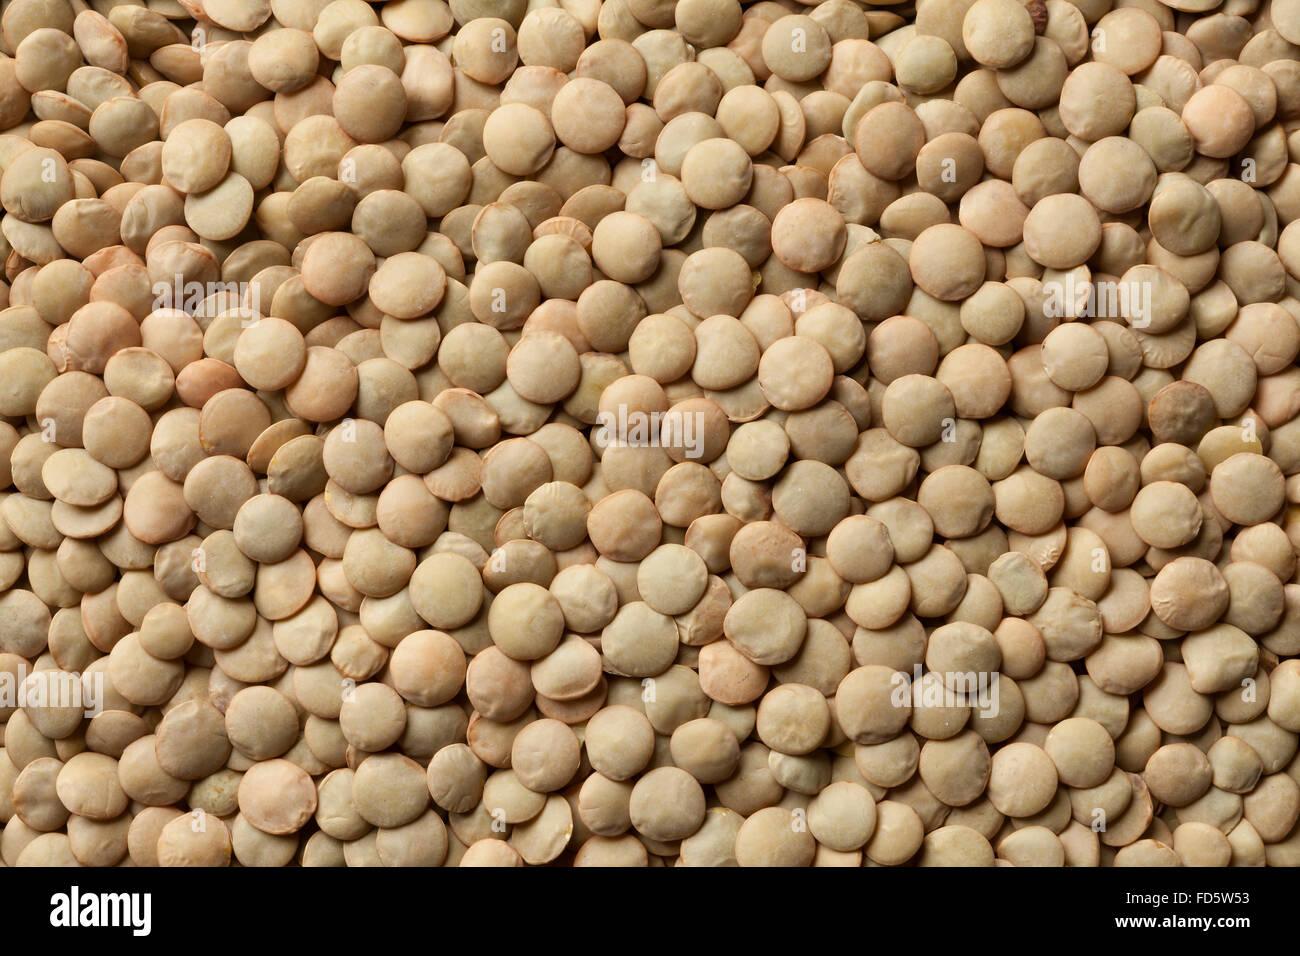 Getrocknete braune Linsen full-frame Stockfoto, Bild: 94171871 - Alamy